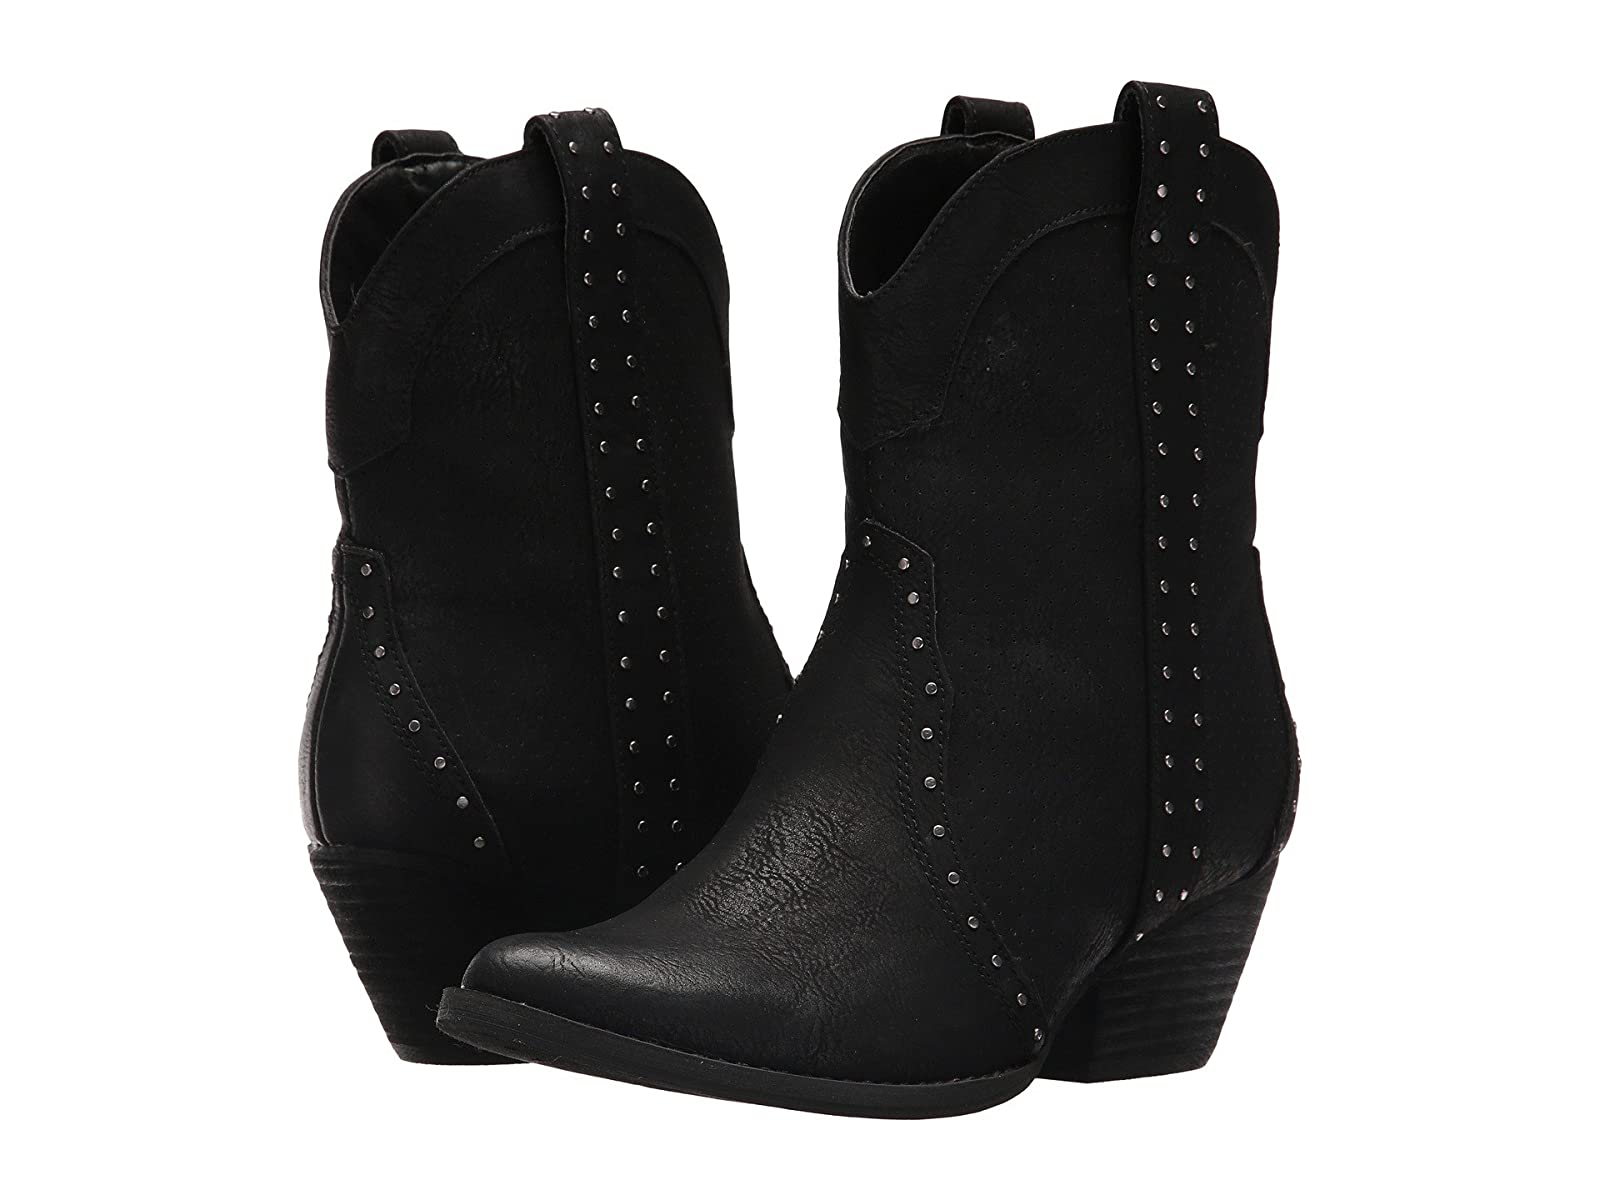 VOLATILE MontezCheap and distinctive eye-catching shoes